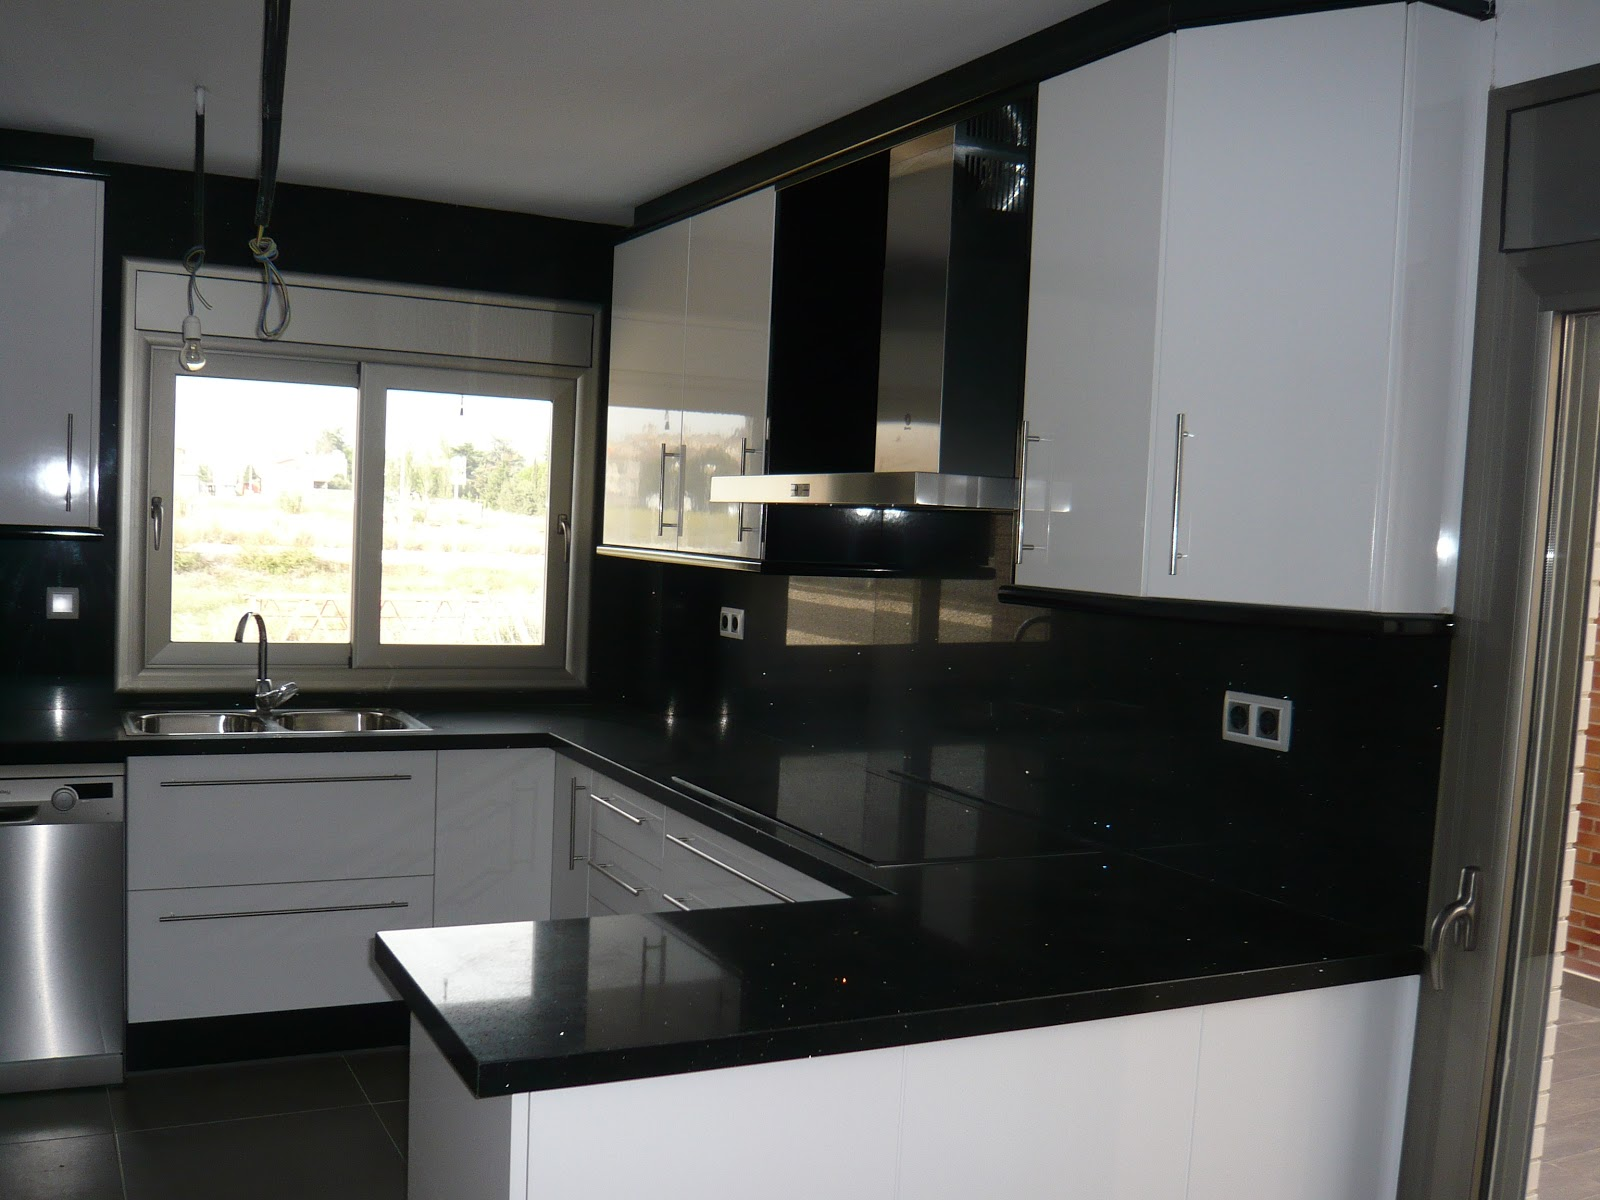 Reuscuina cocina de formica blanca negra for Cocina blanca y negra